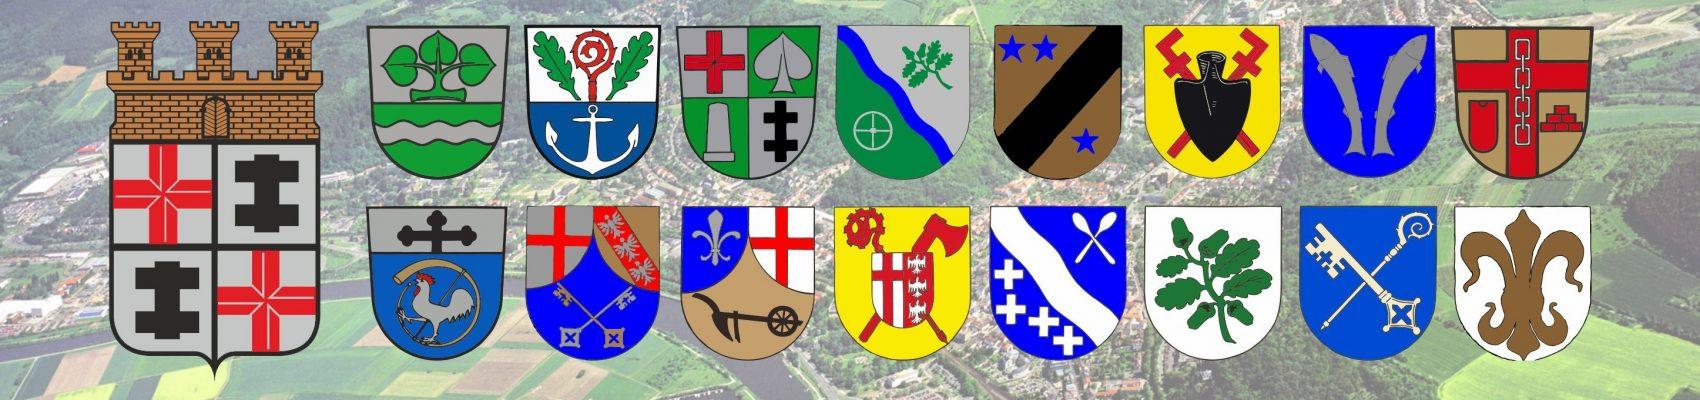 Logos der Stadtteile